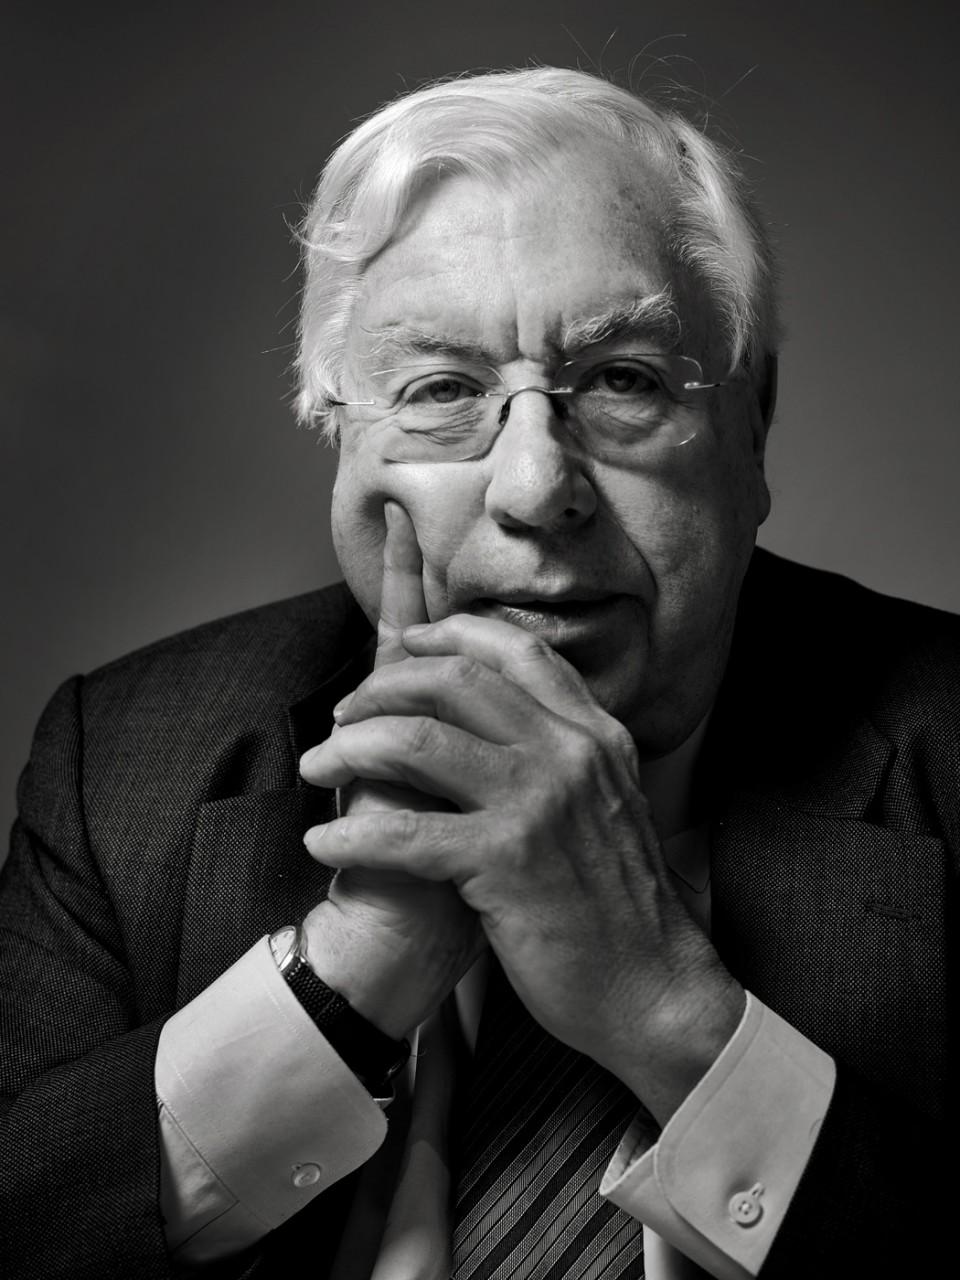 John Kornblum, former ambassador of the United States to Germany